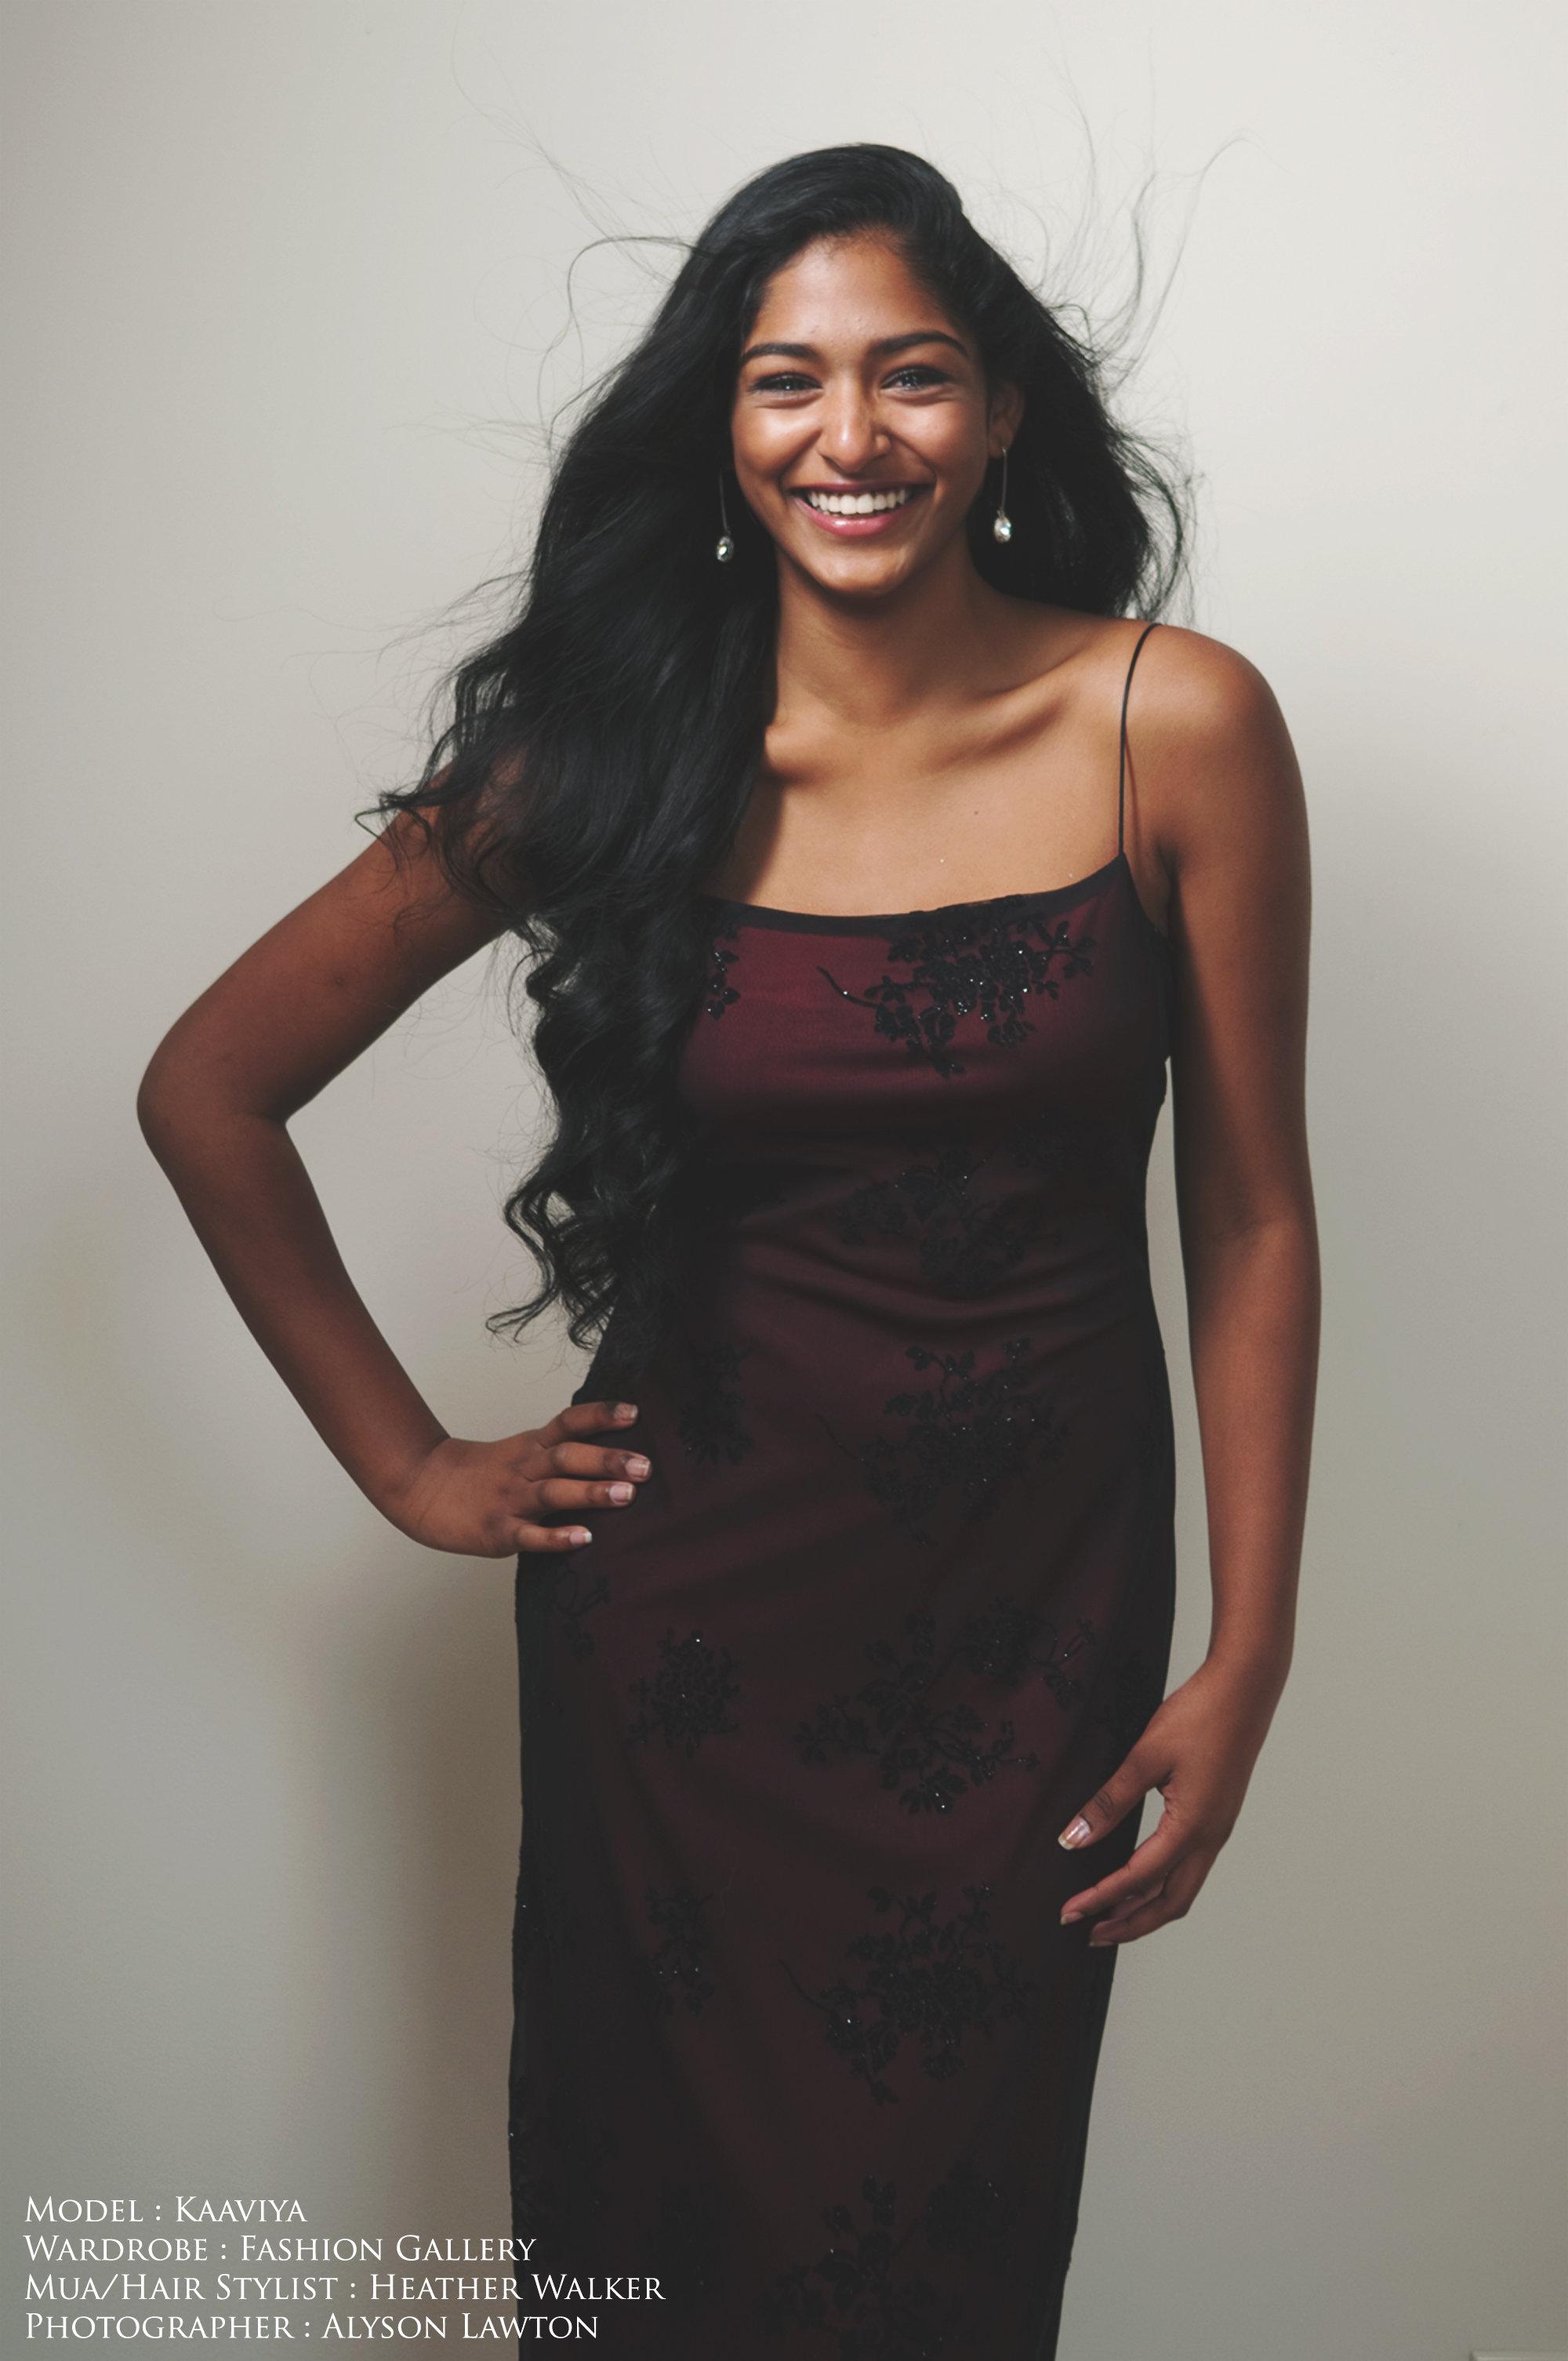 Model: Kaaviya  Clothing: Style in the City  Hair Stylist | MUA: Heather Walker  Photographer: Alyson Lawton